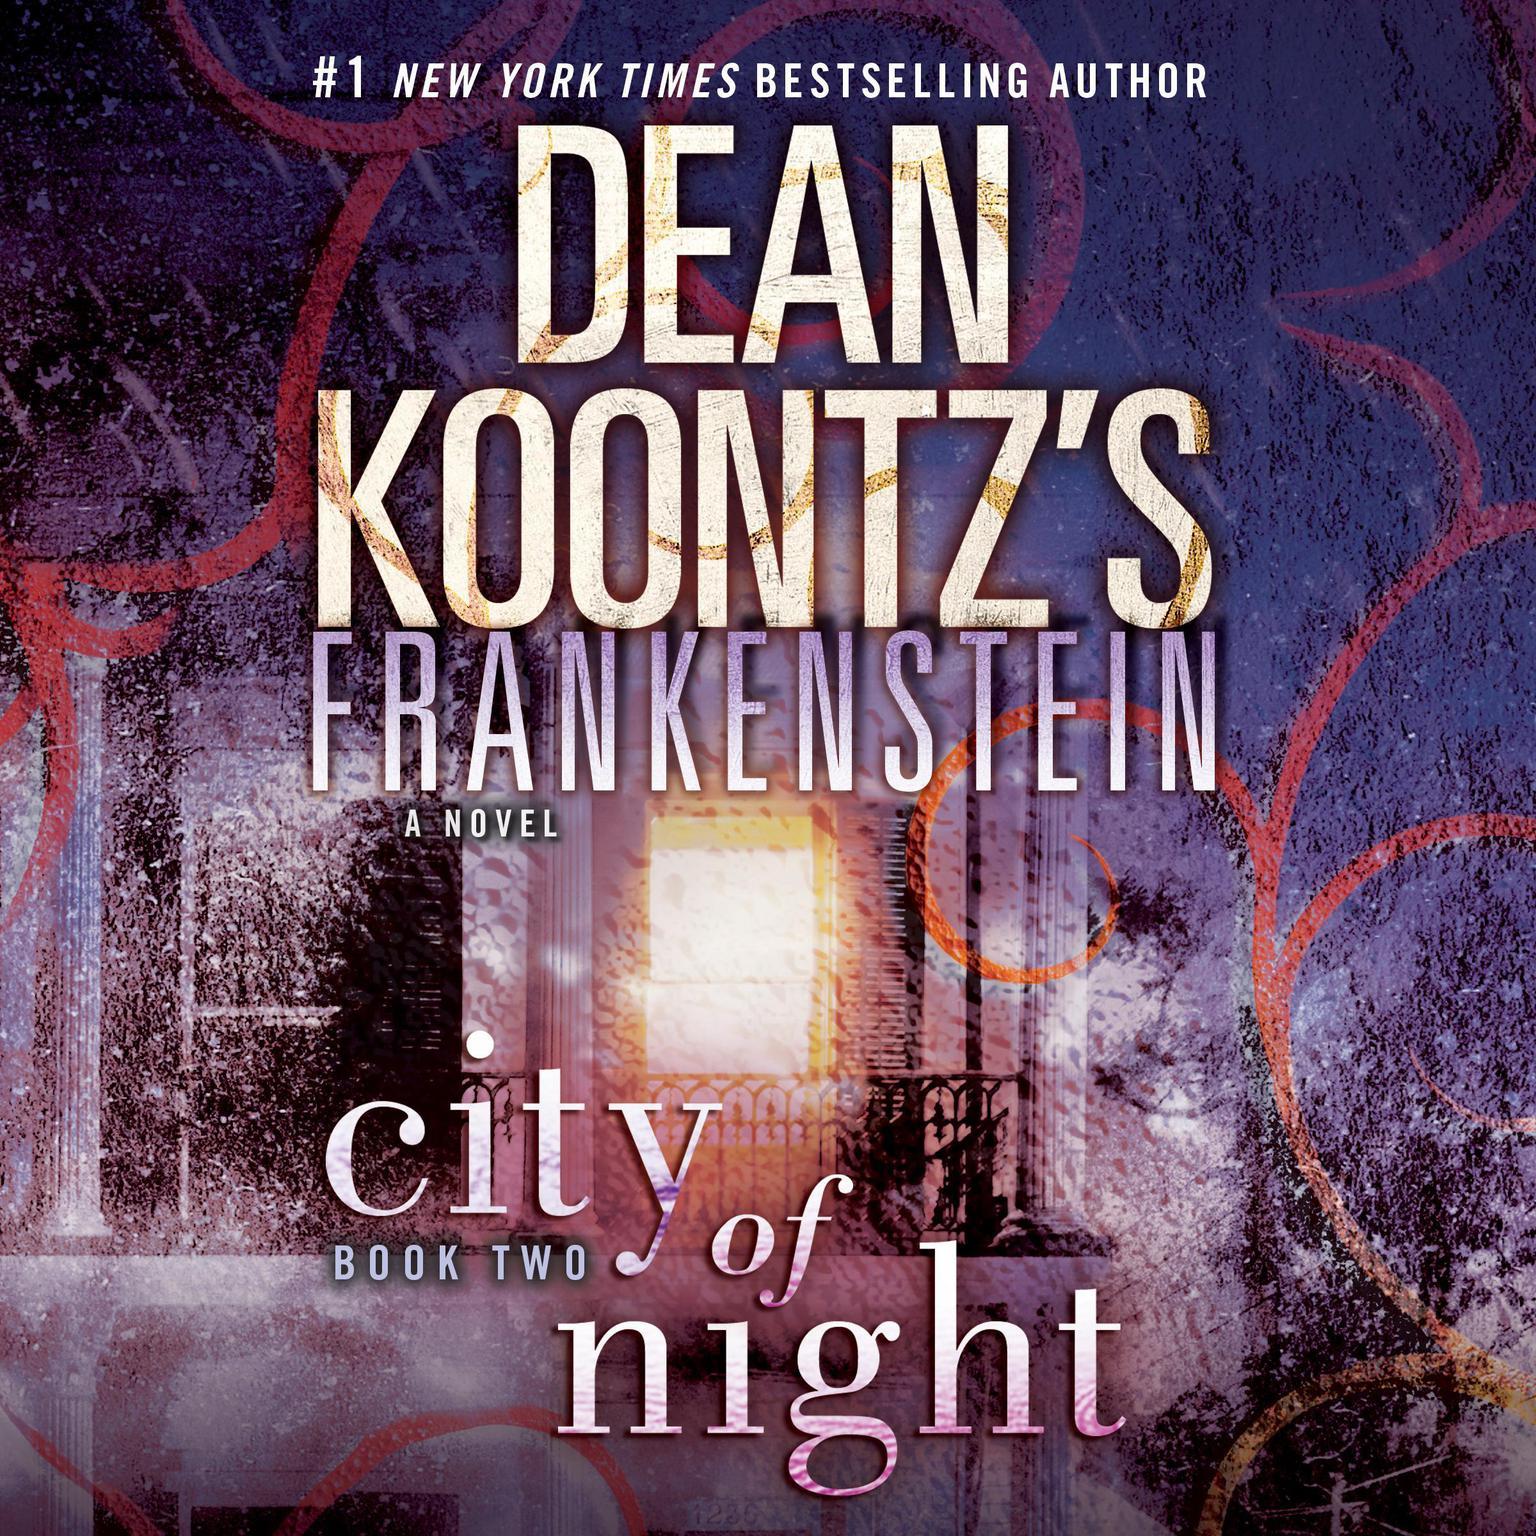 Printable Frankenstein: City of Night Audiobook Cover Art